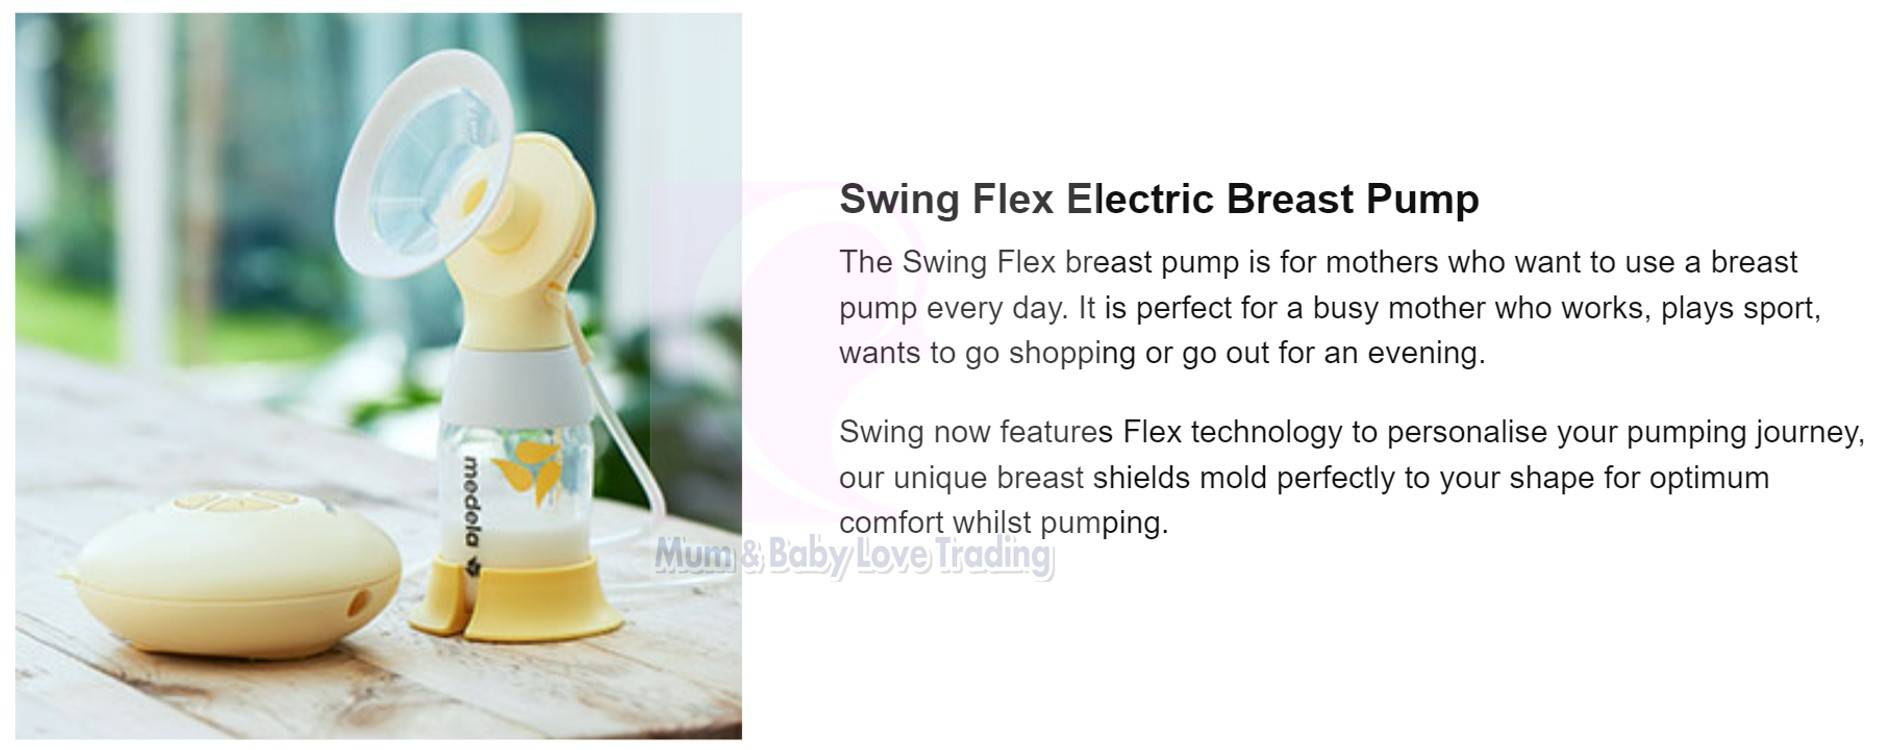 Medela Swing Flex Single Electric Breast Pump 21mm 24mm